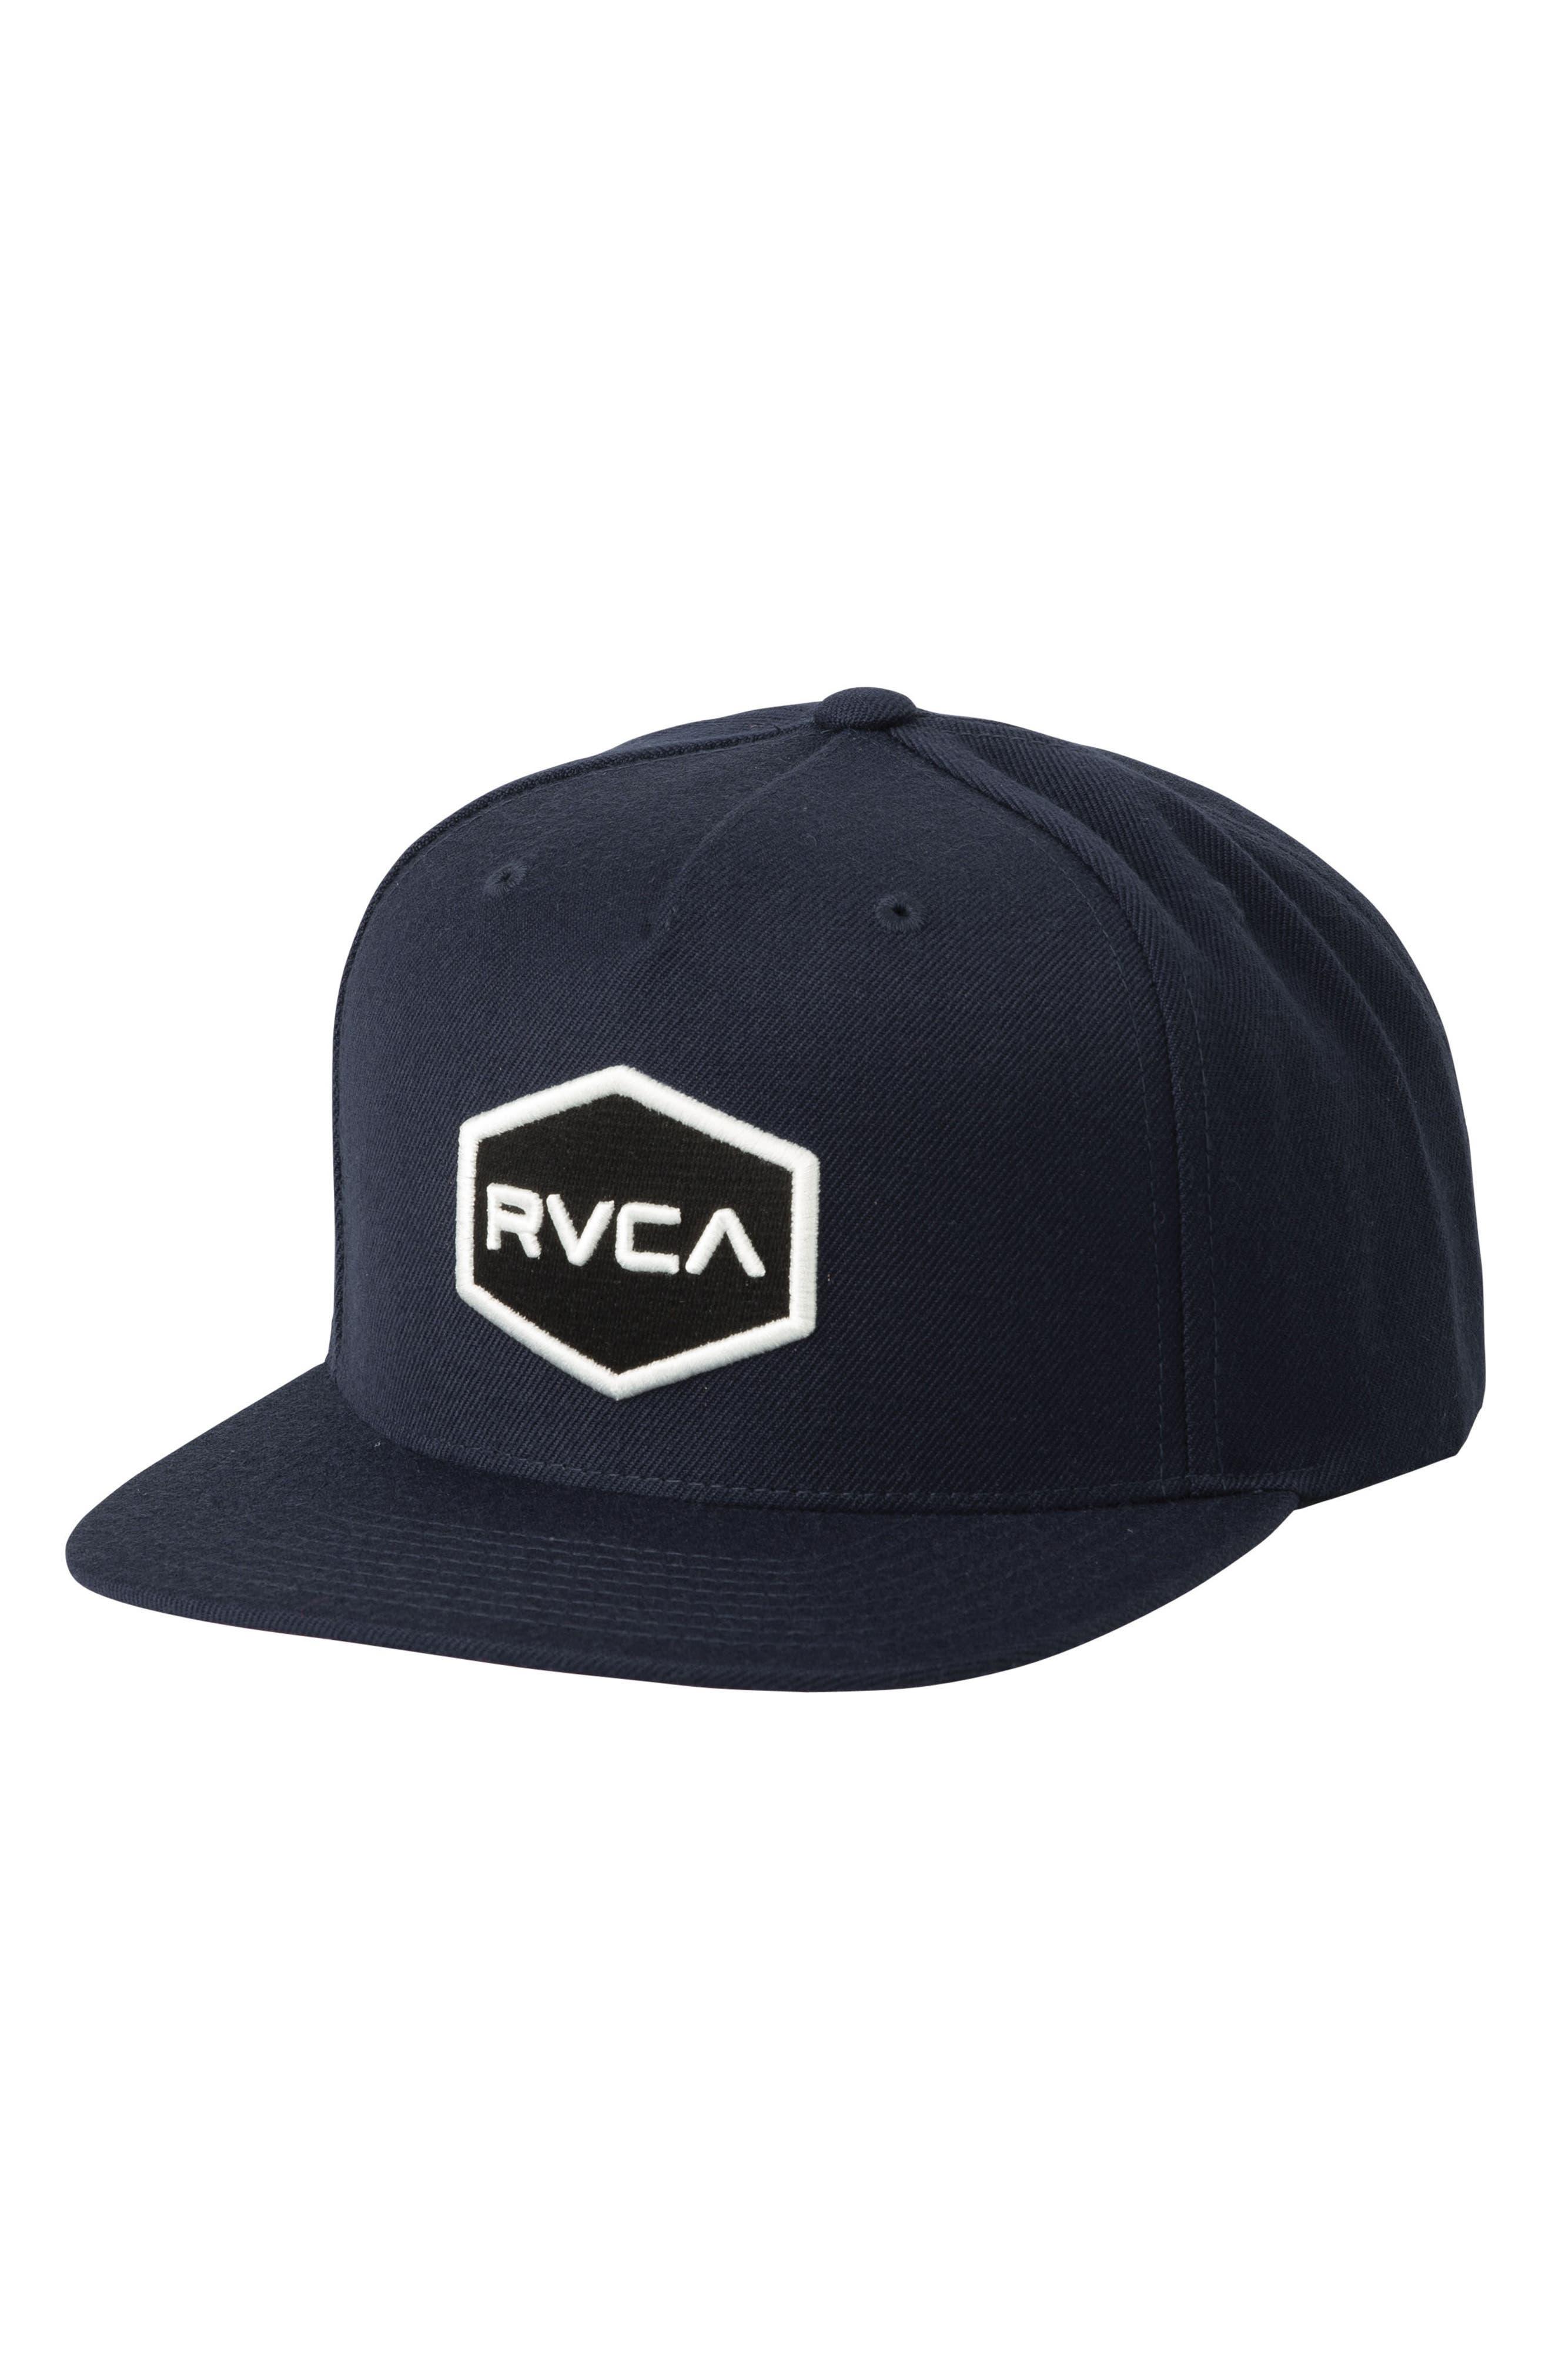 RVCA Commonwealth Snapback Baseball Cap